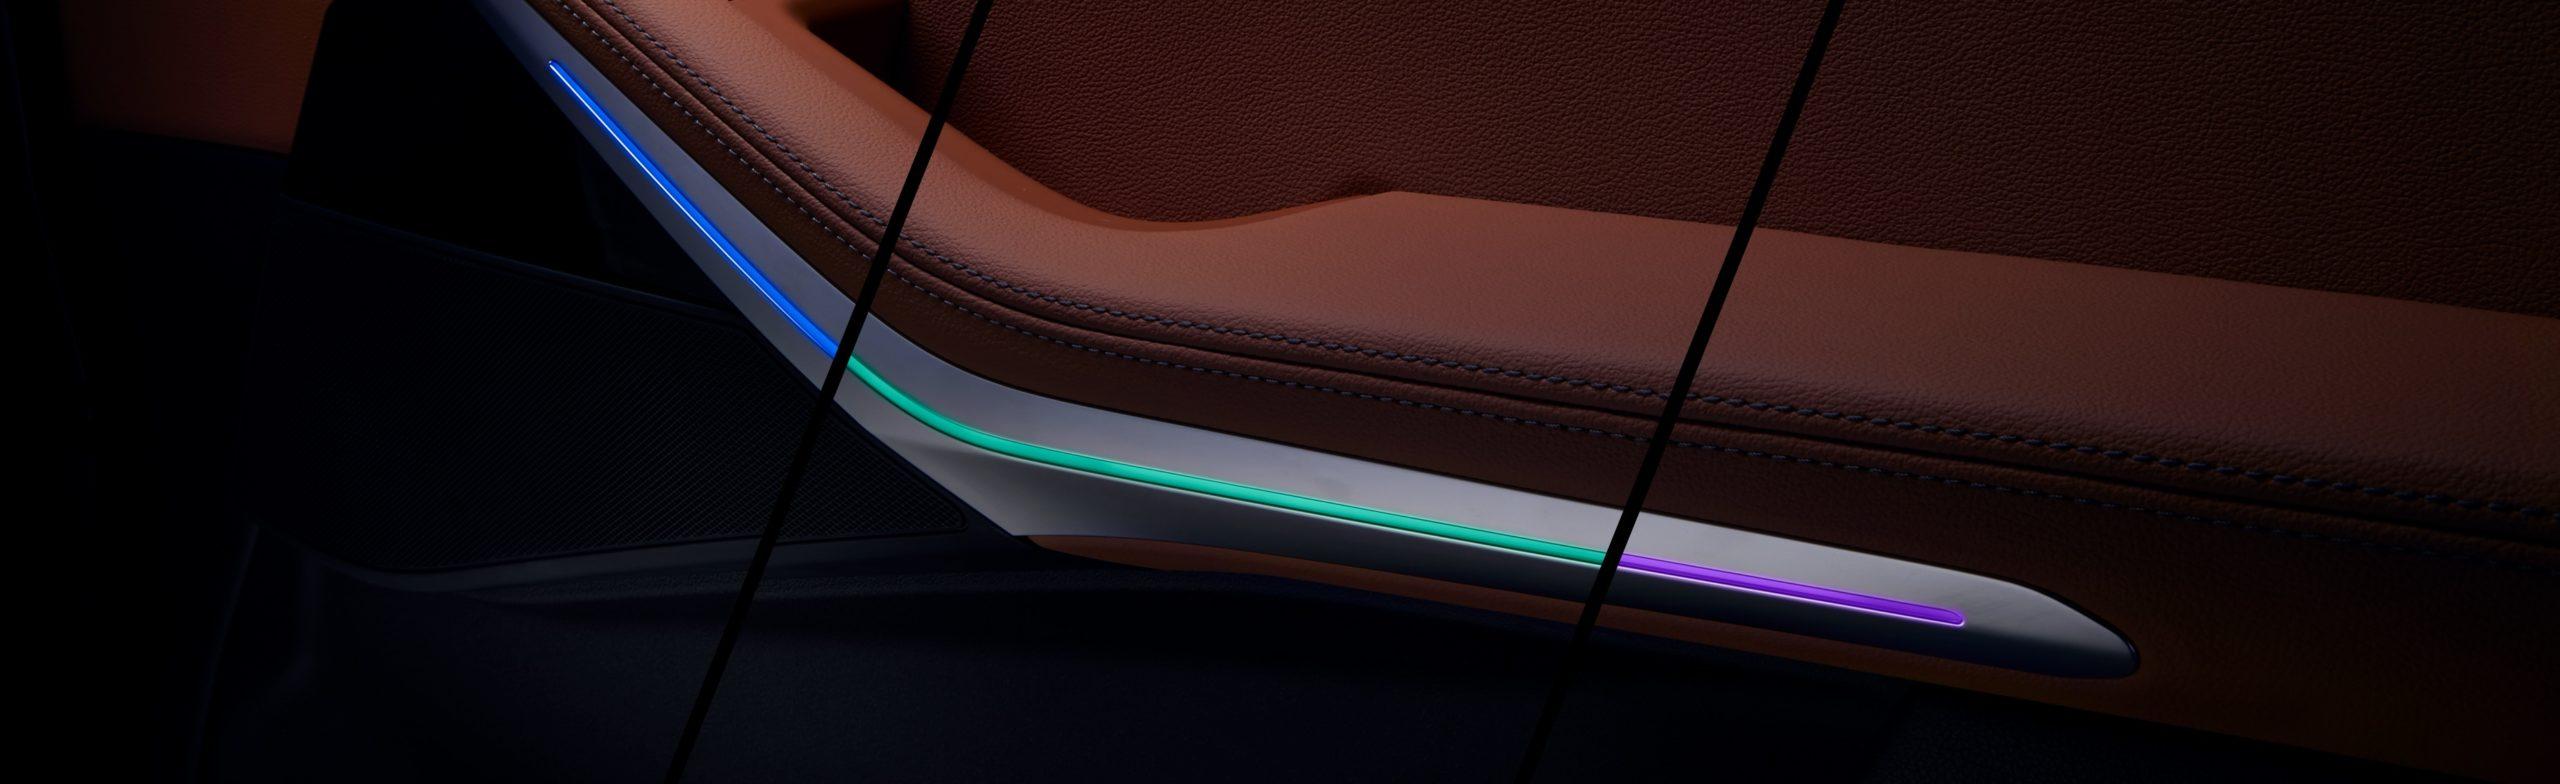 BMW X5 Interior Lighting with Lacks